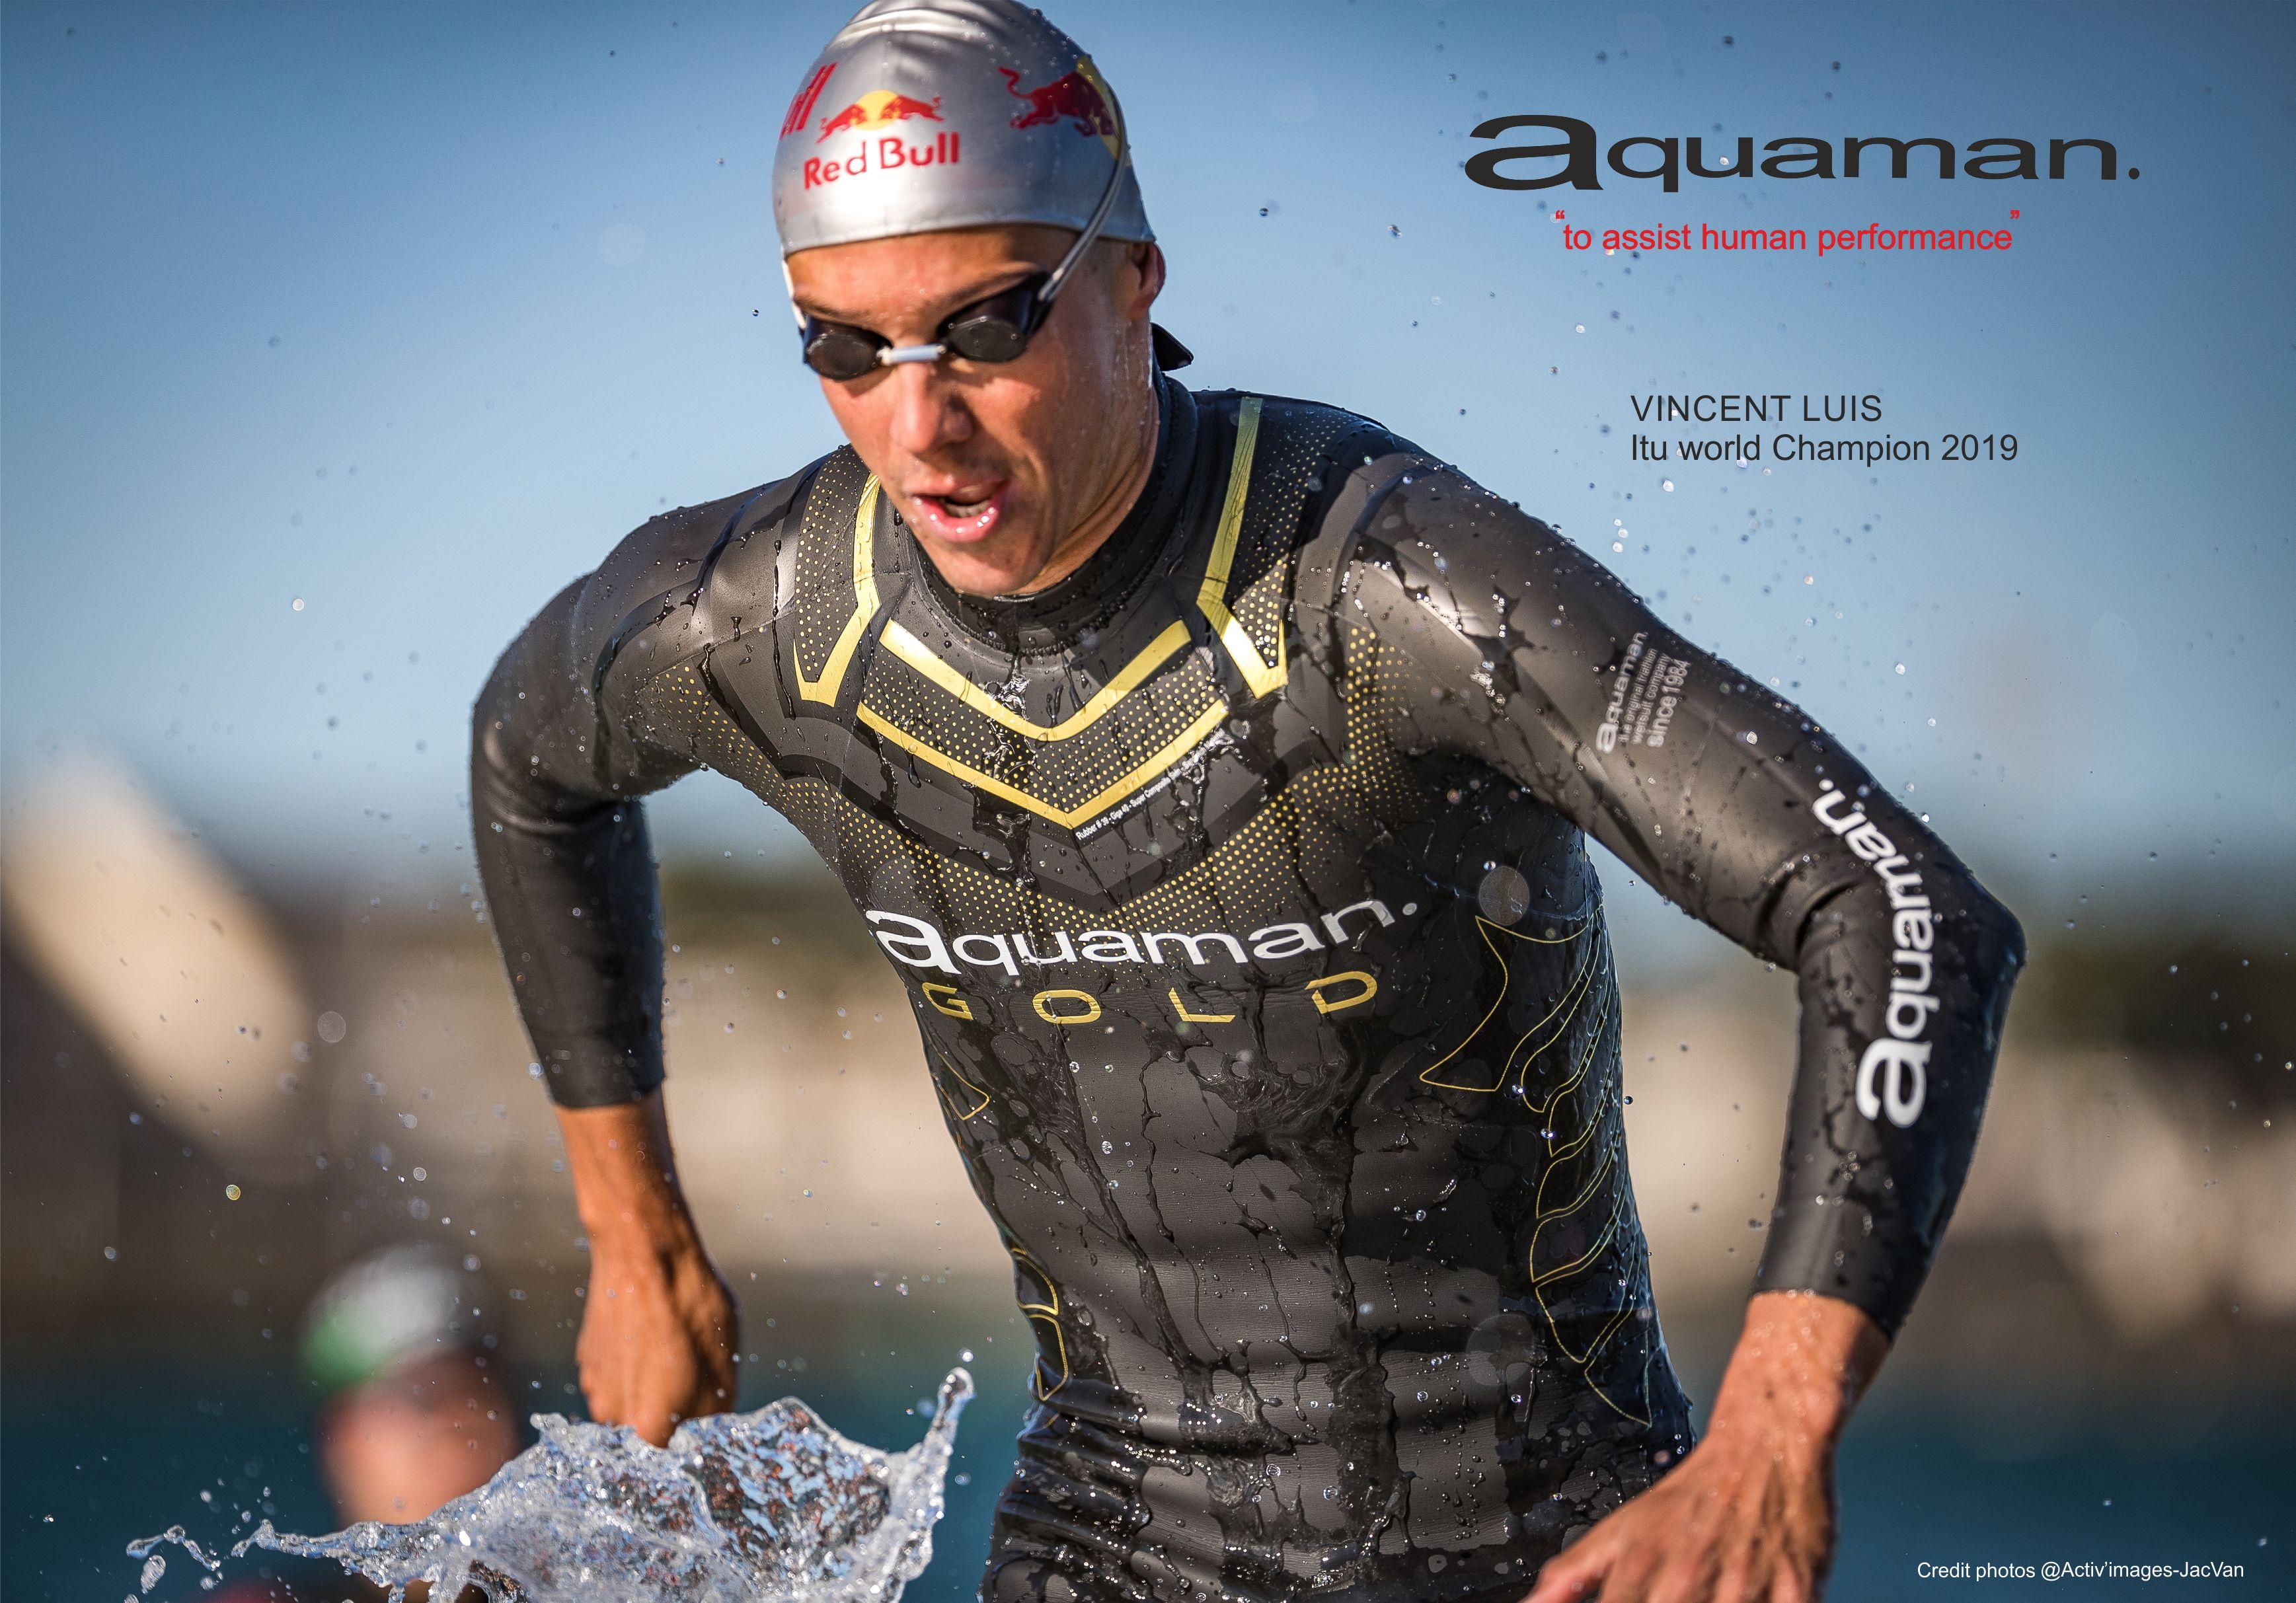 Aquaman : To assist human performance